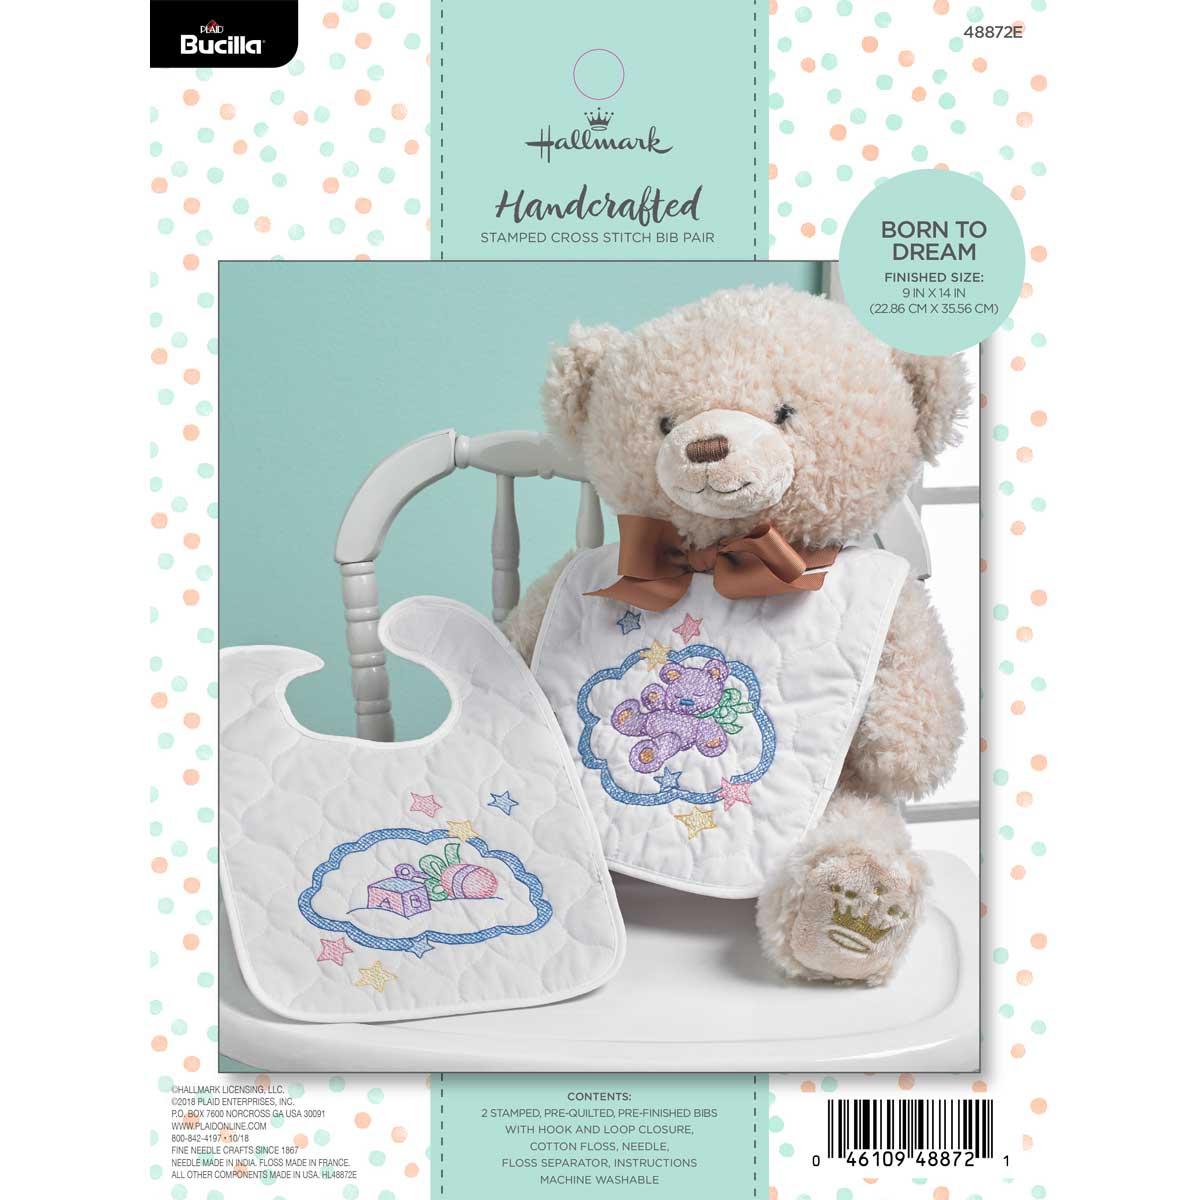 Bucilla ® Baby - Stamped Cross Stitch - Crib Ensembles - Hallmark - Born to Dream - Bib Pair Kit